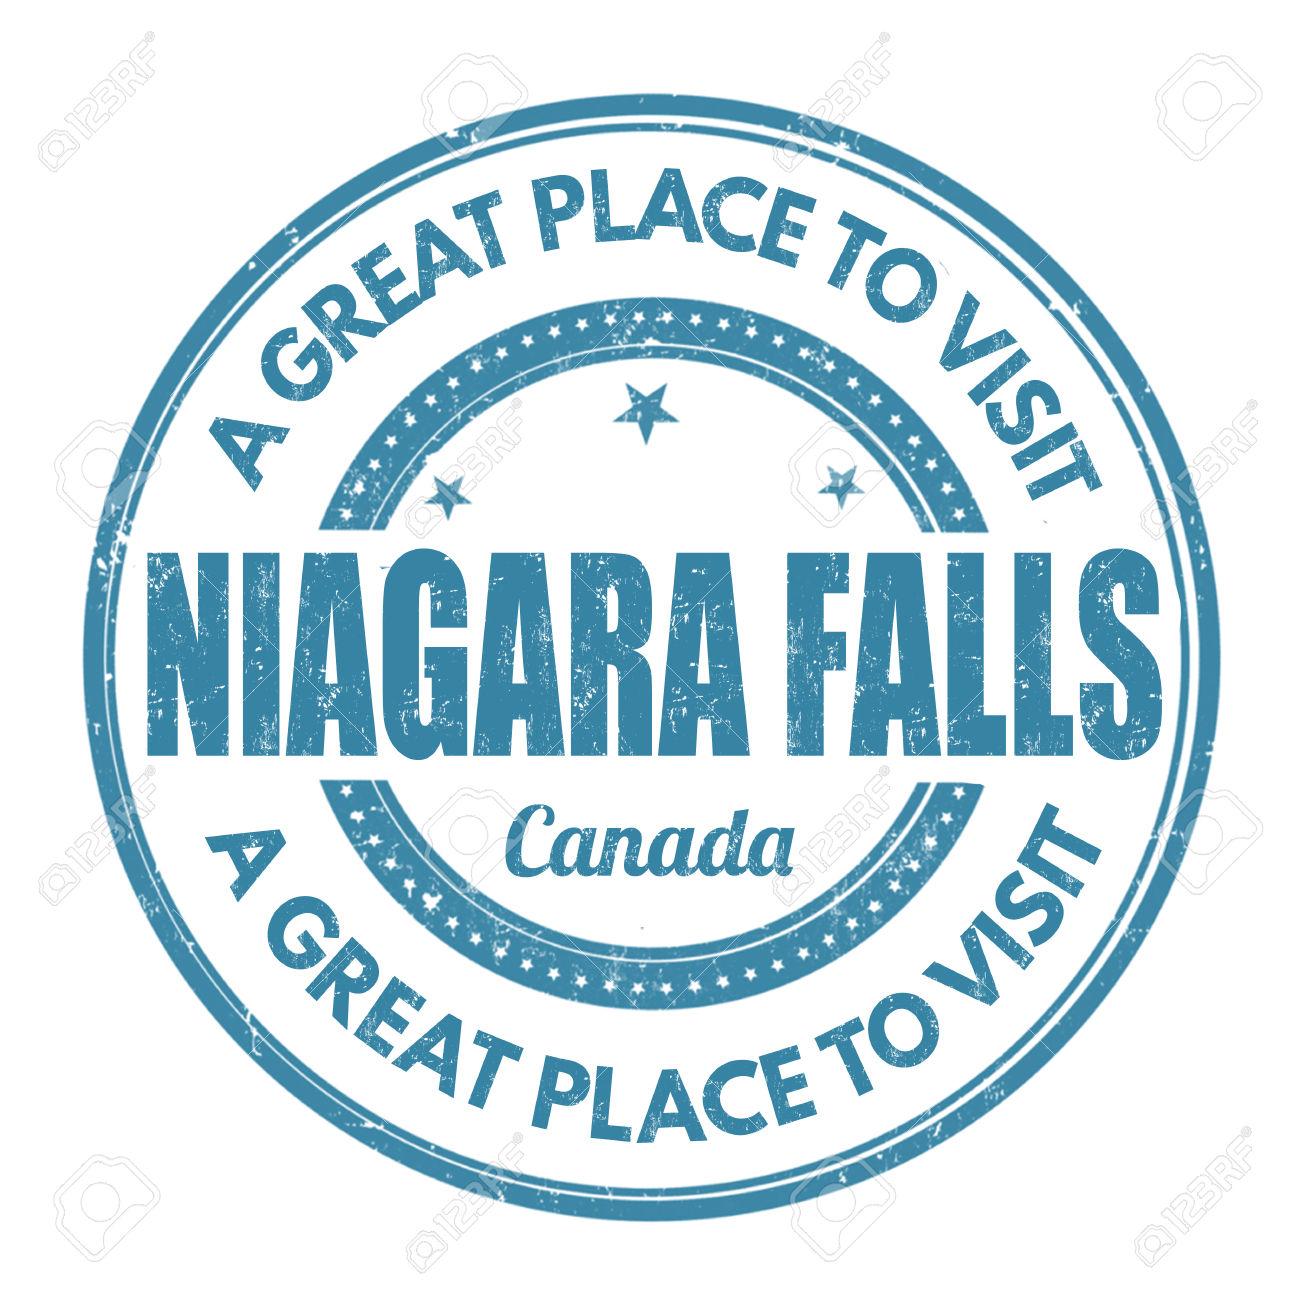 Niagara Falls clipart #11, Download drawings